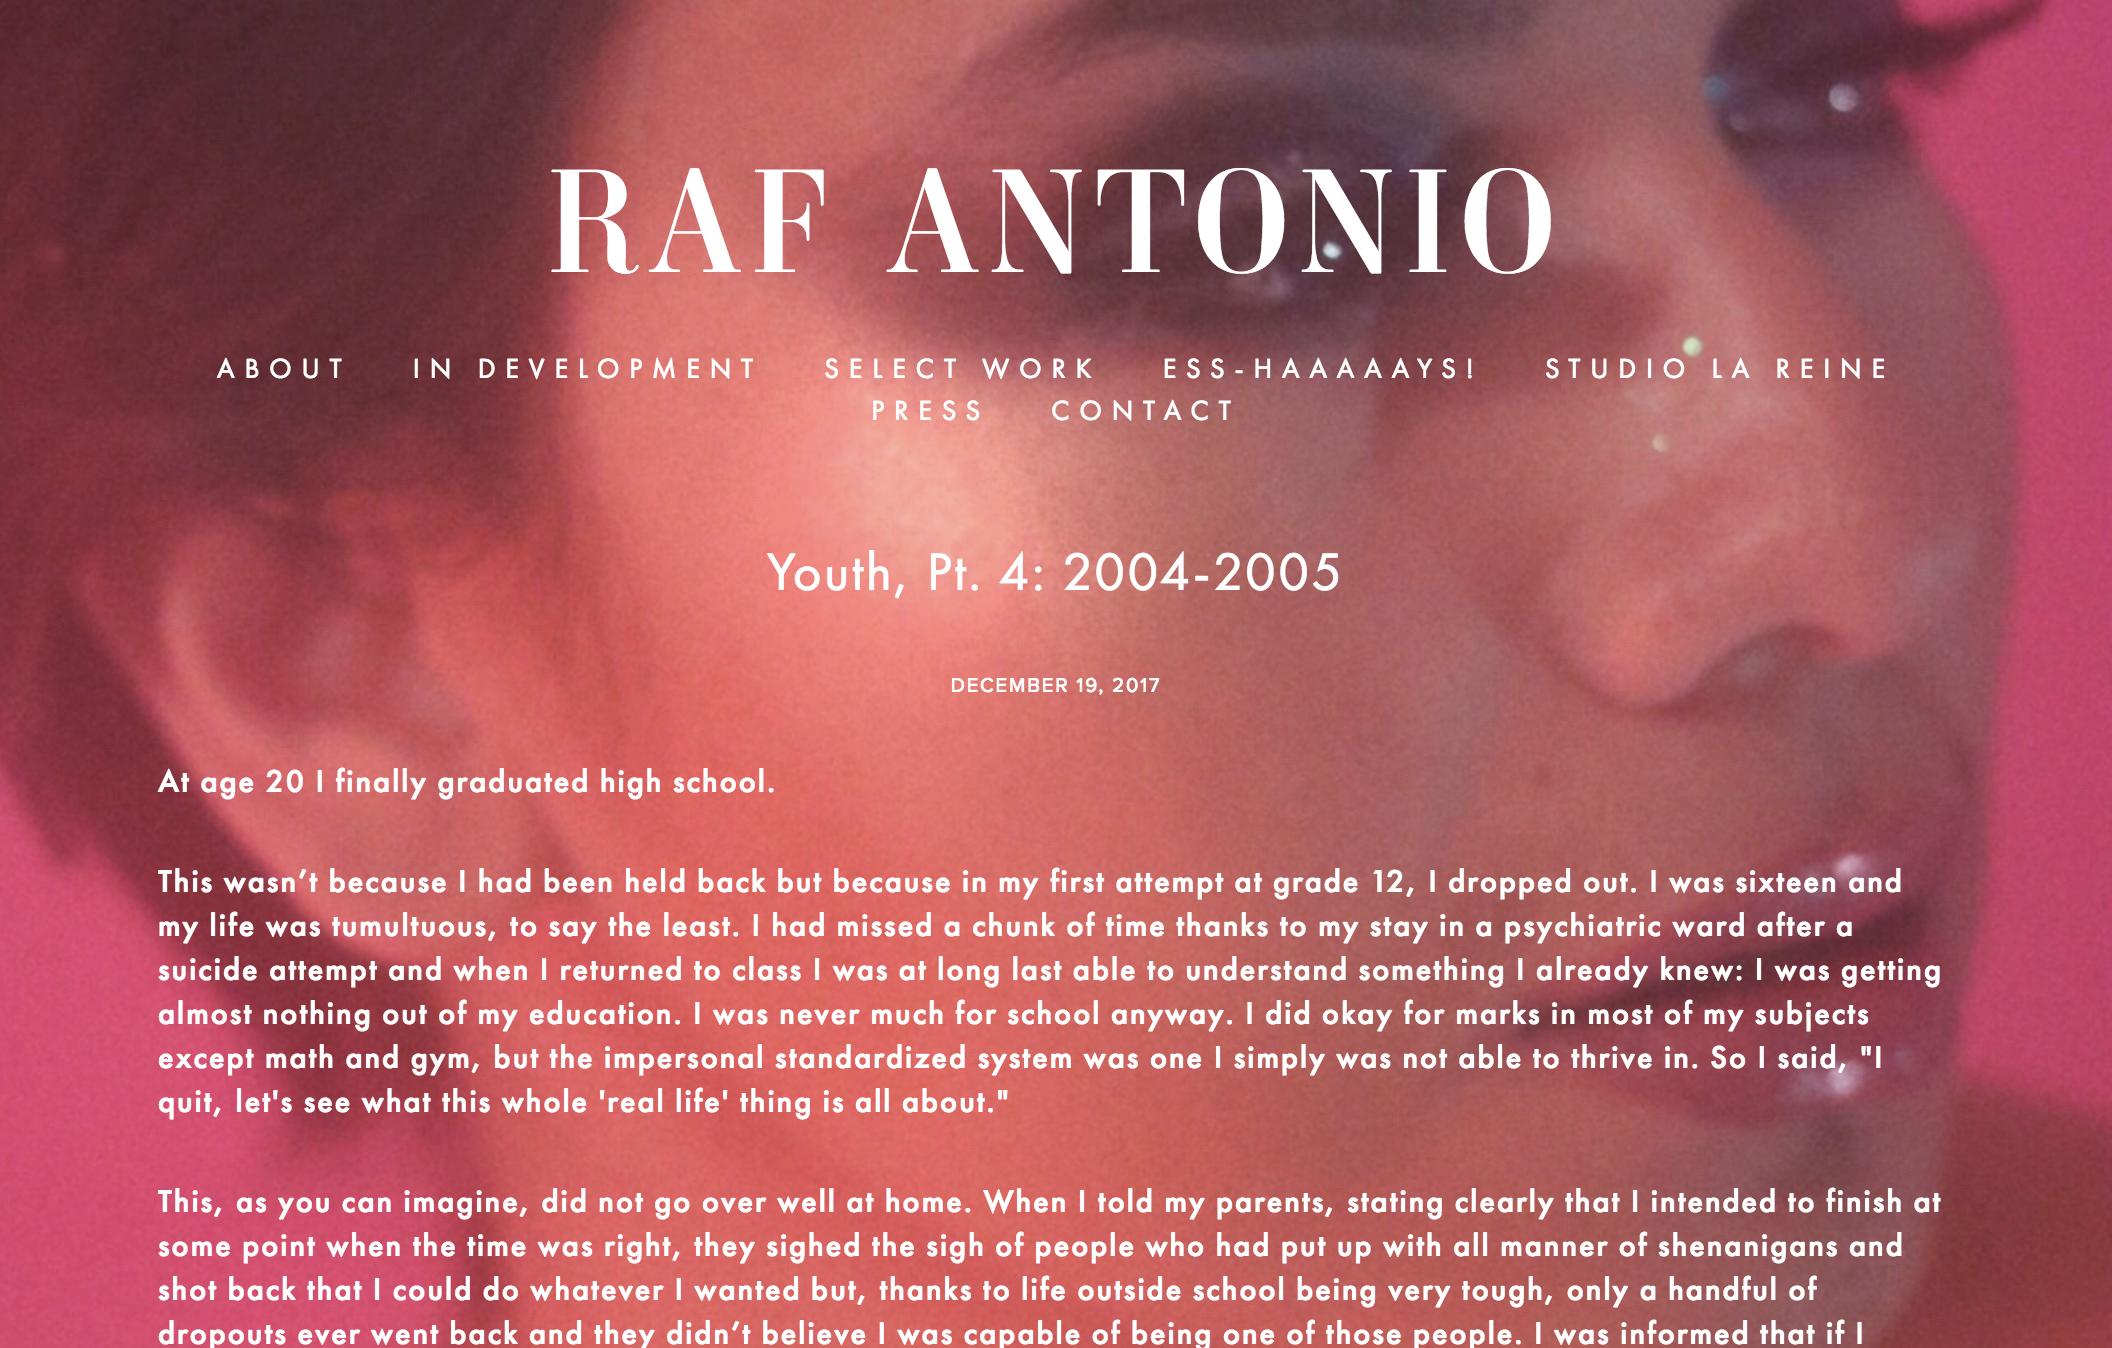 Raf Antonio (Dec 2017), webpage detail.